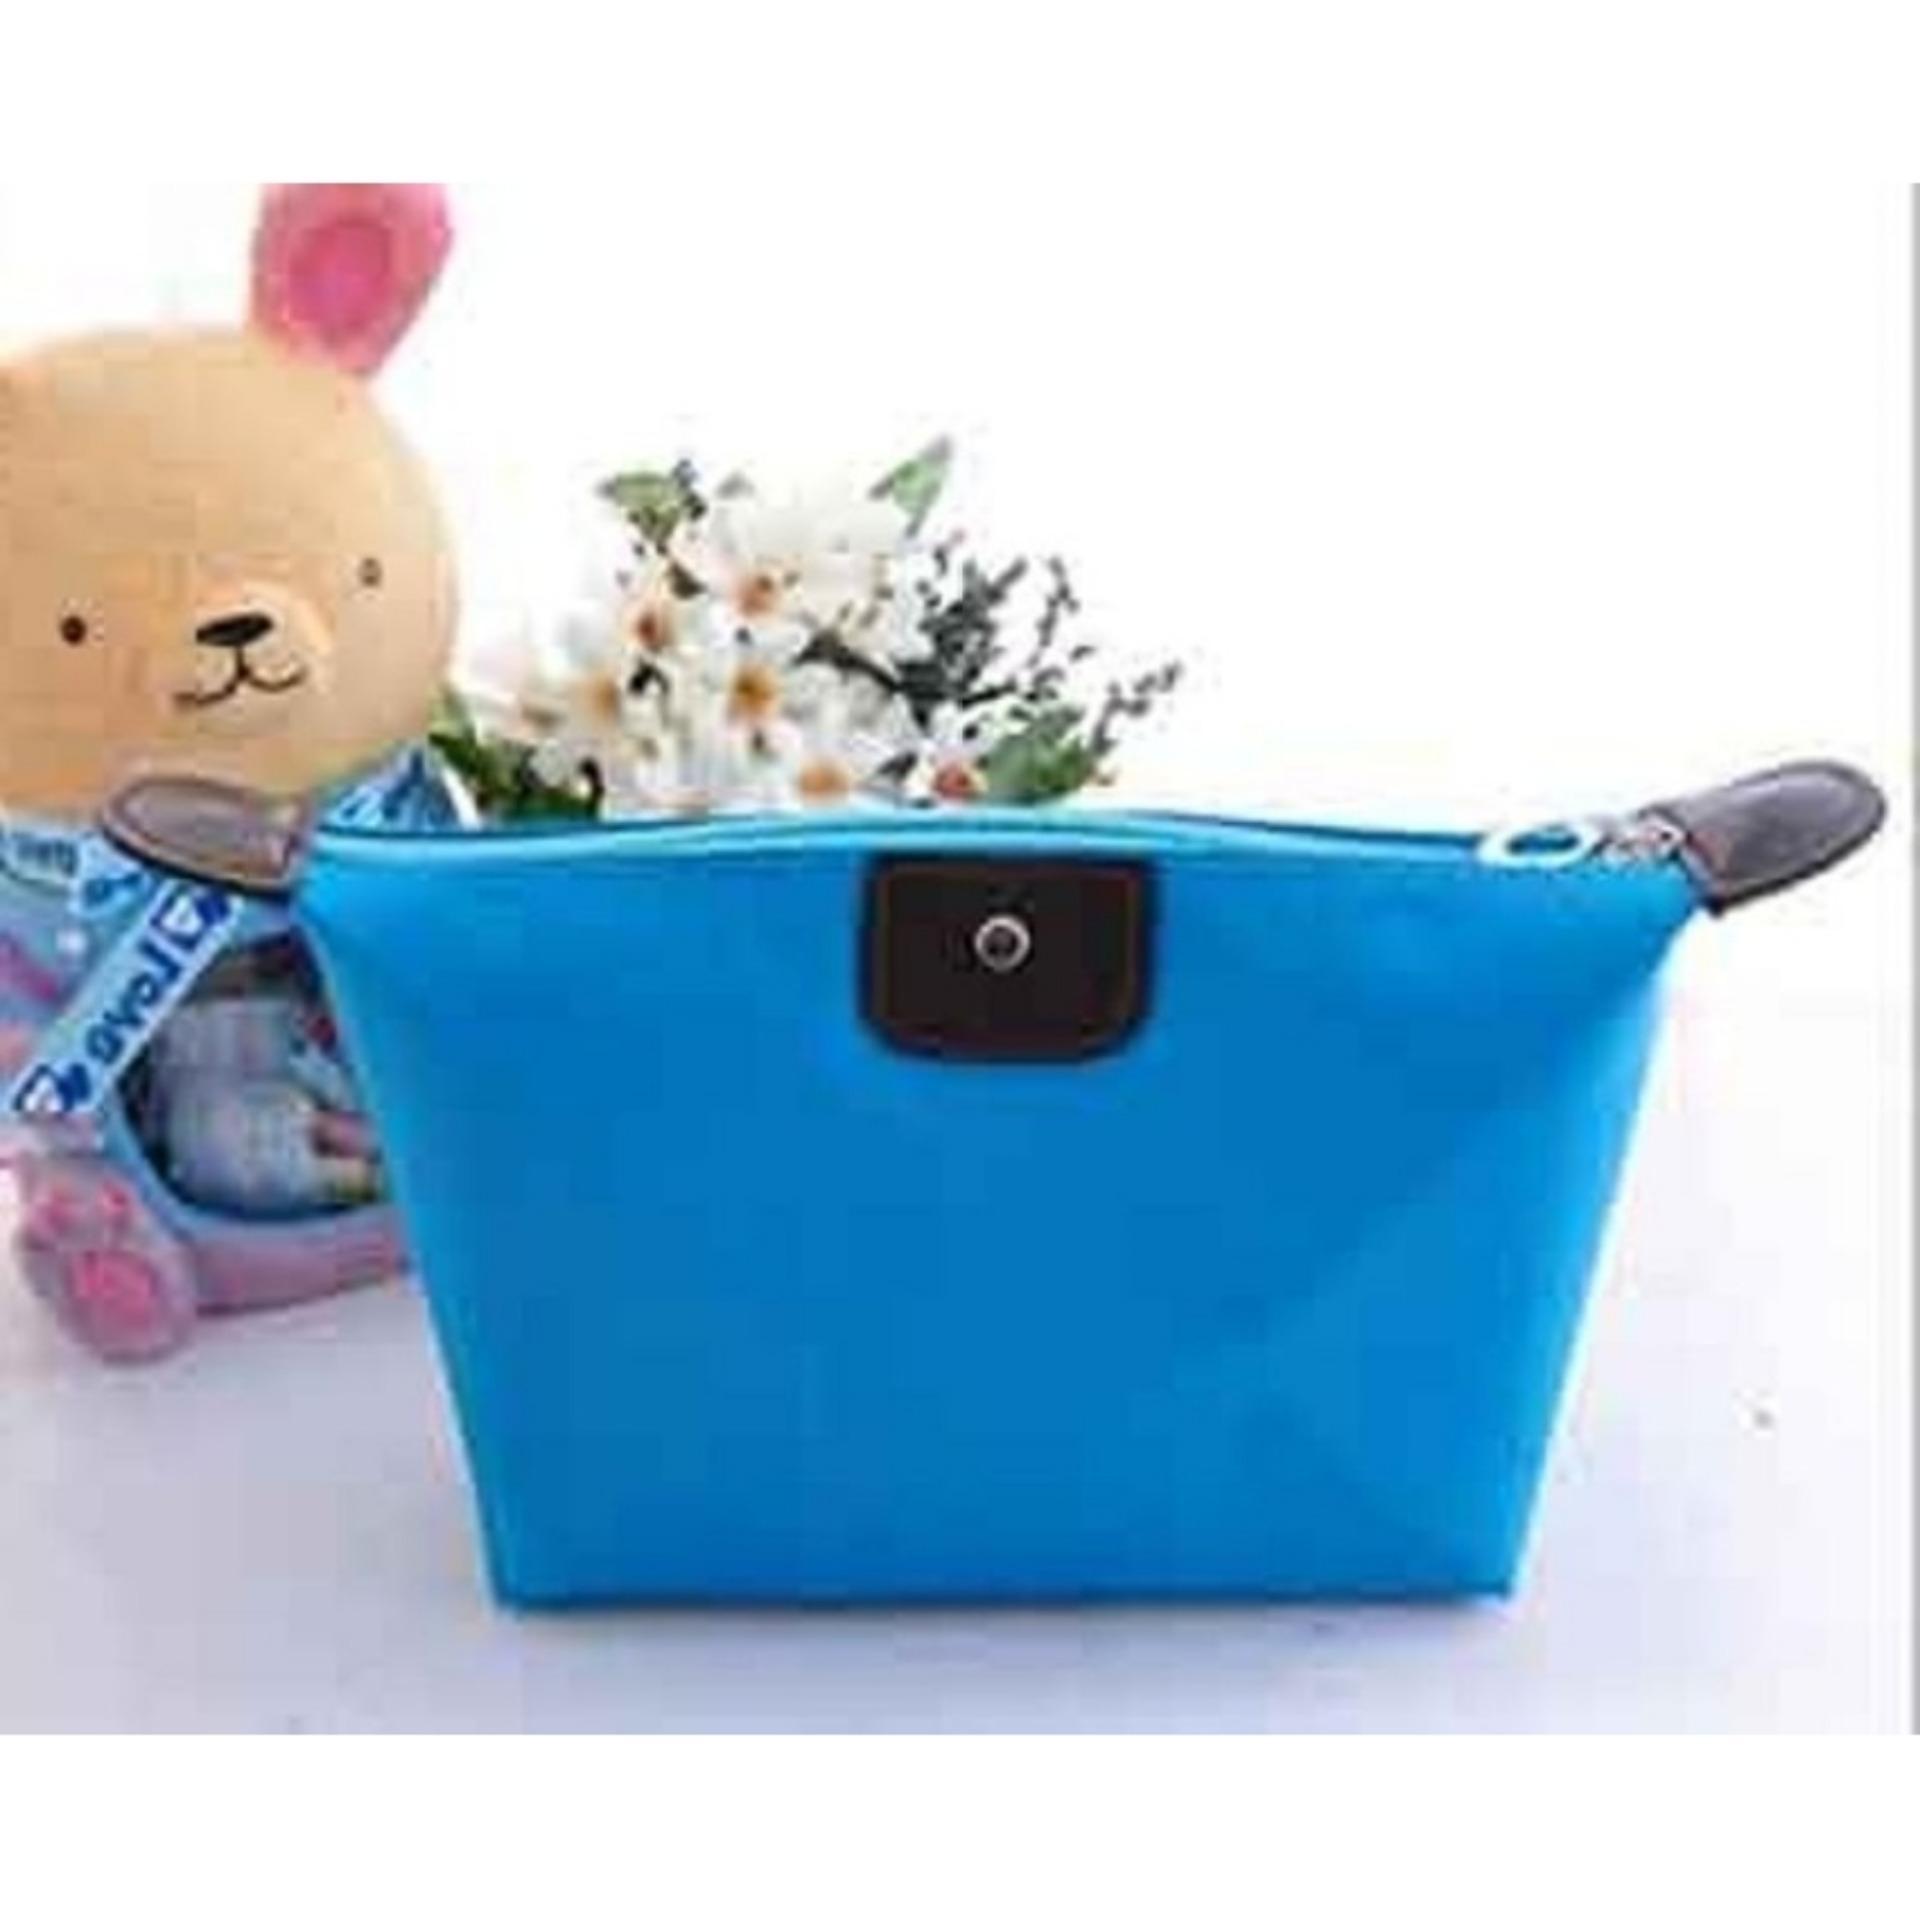 Penjualan Fthree - Tas Kosmetik Mini - Cosmetic Bag Pouch Purse Tempat Dompet Kosmetic – BIRU MUDA terbaik murah - Hanya Rp5.532